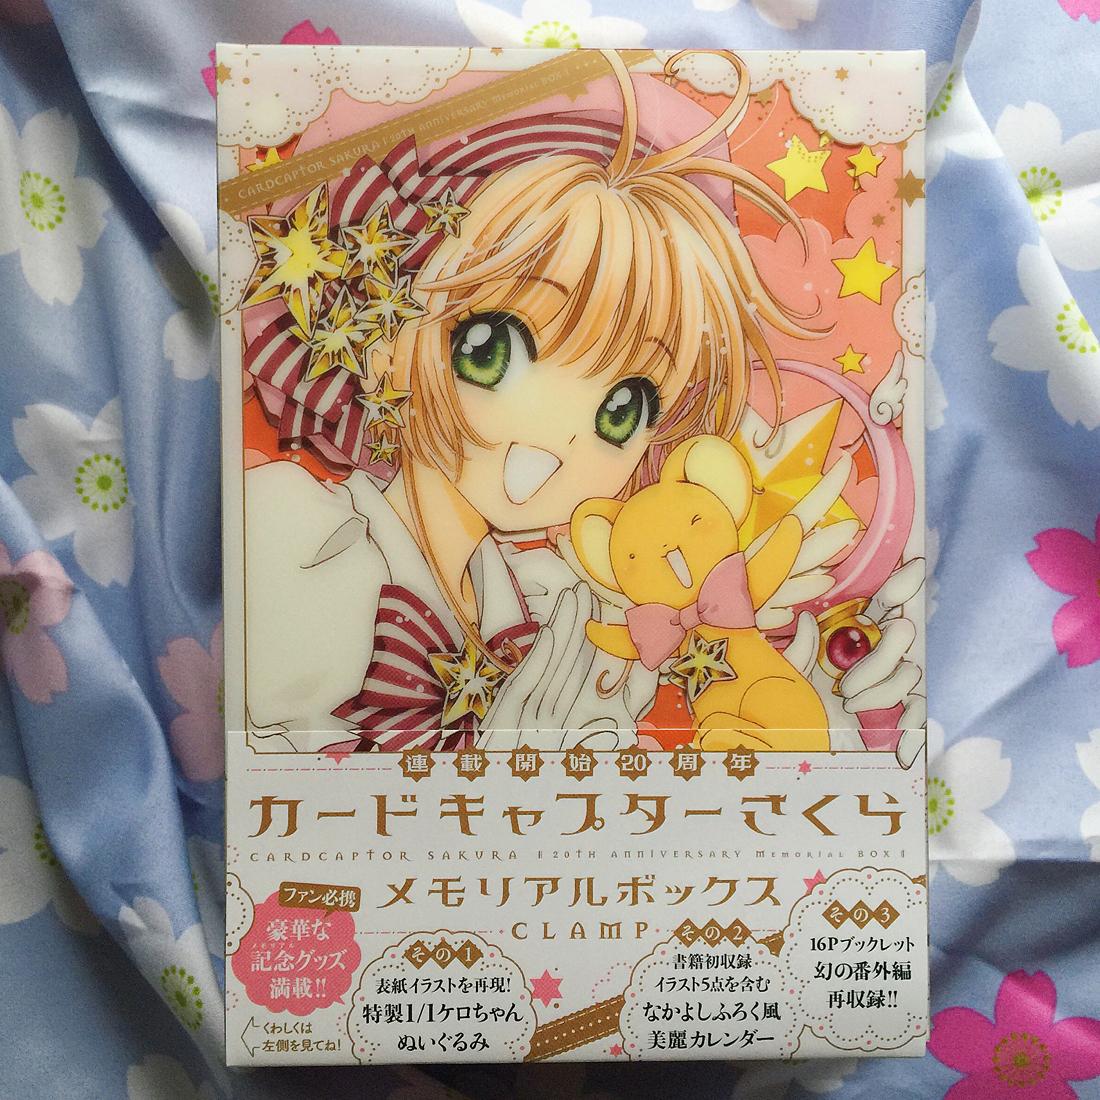 cardcaptor-sakura-memorial-box-4